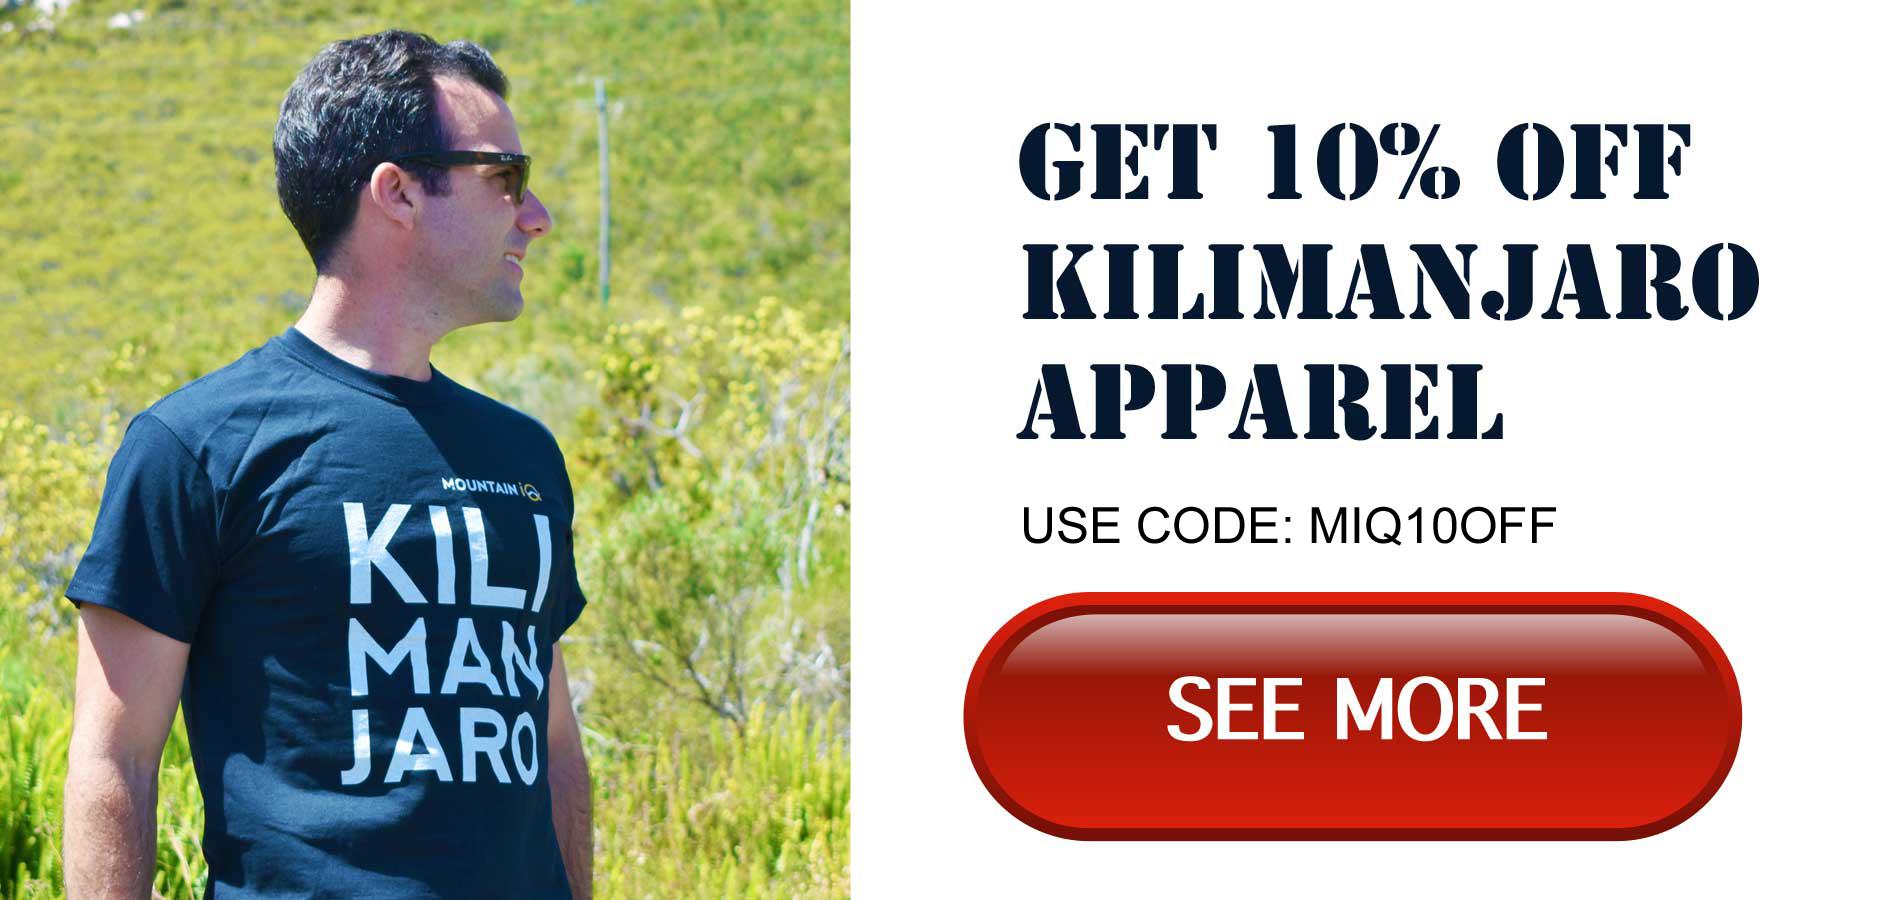 Climb Kilimanjaro Guide Mark Whitman